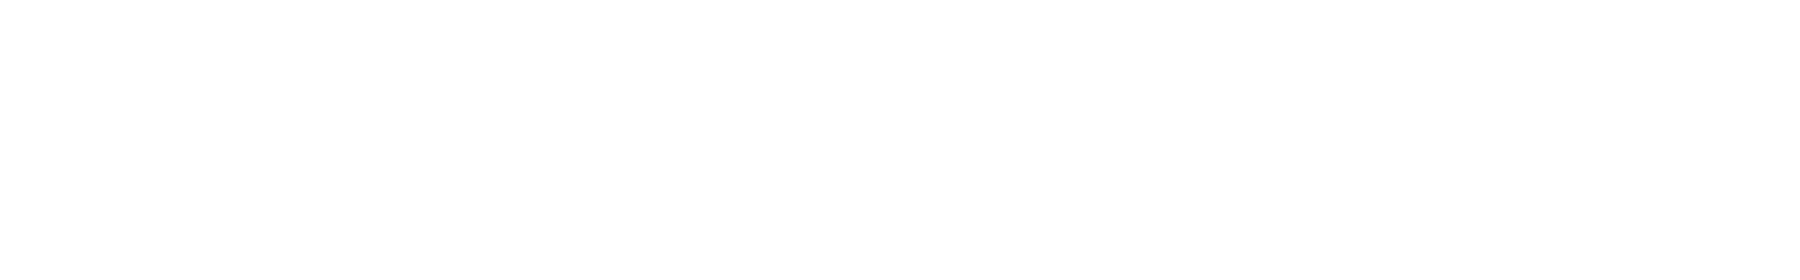 blbc cinedrumsb 110 04